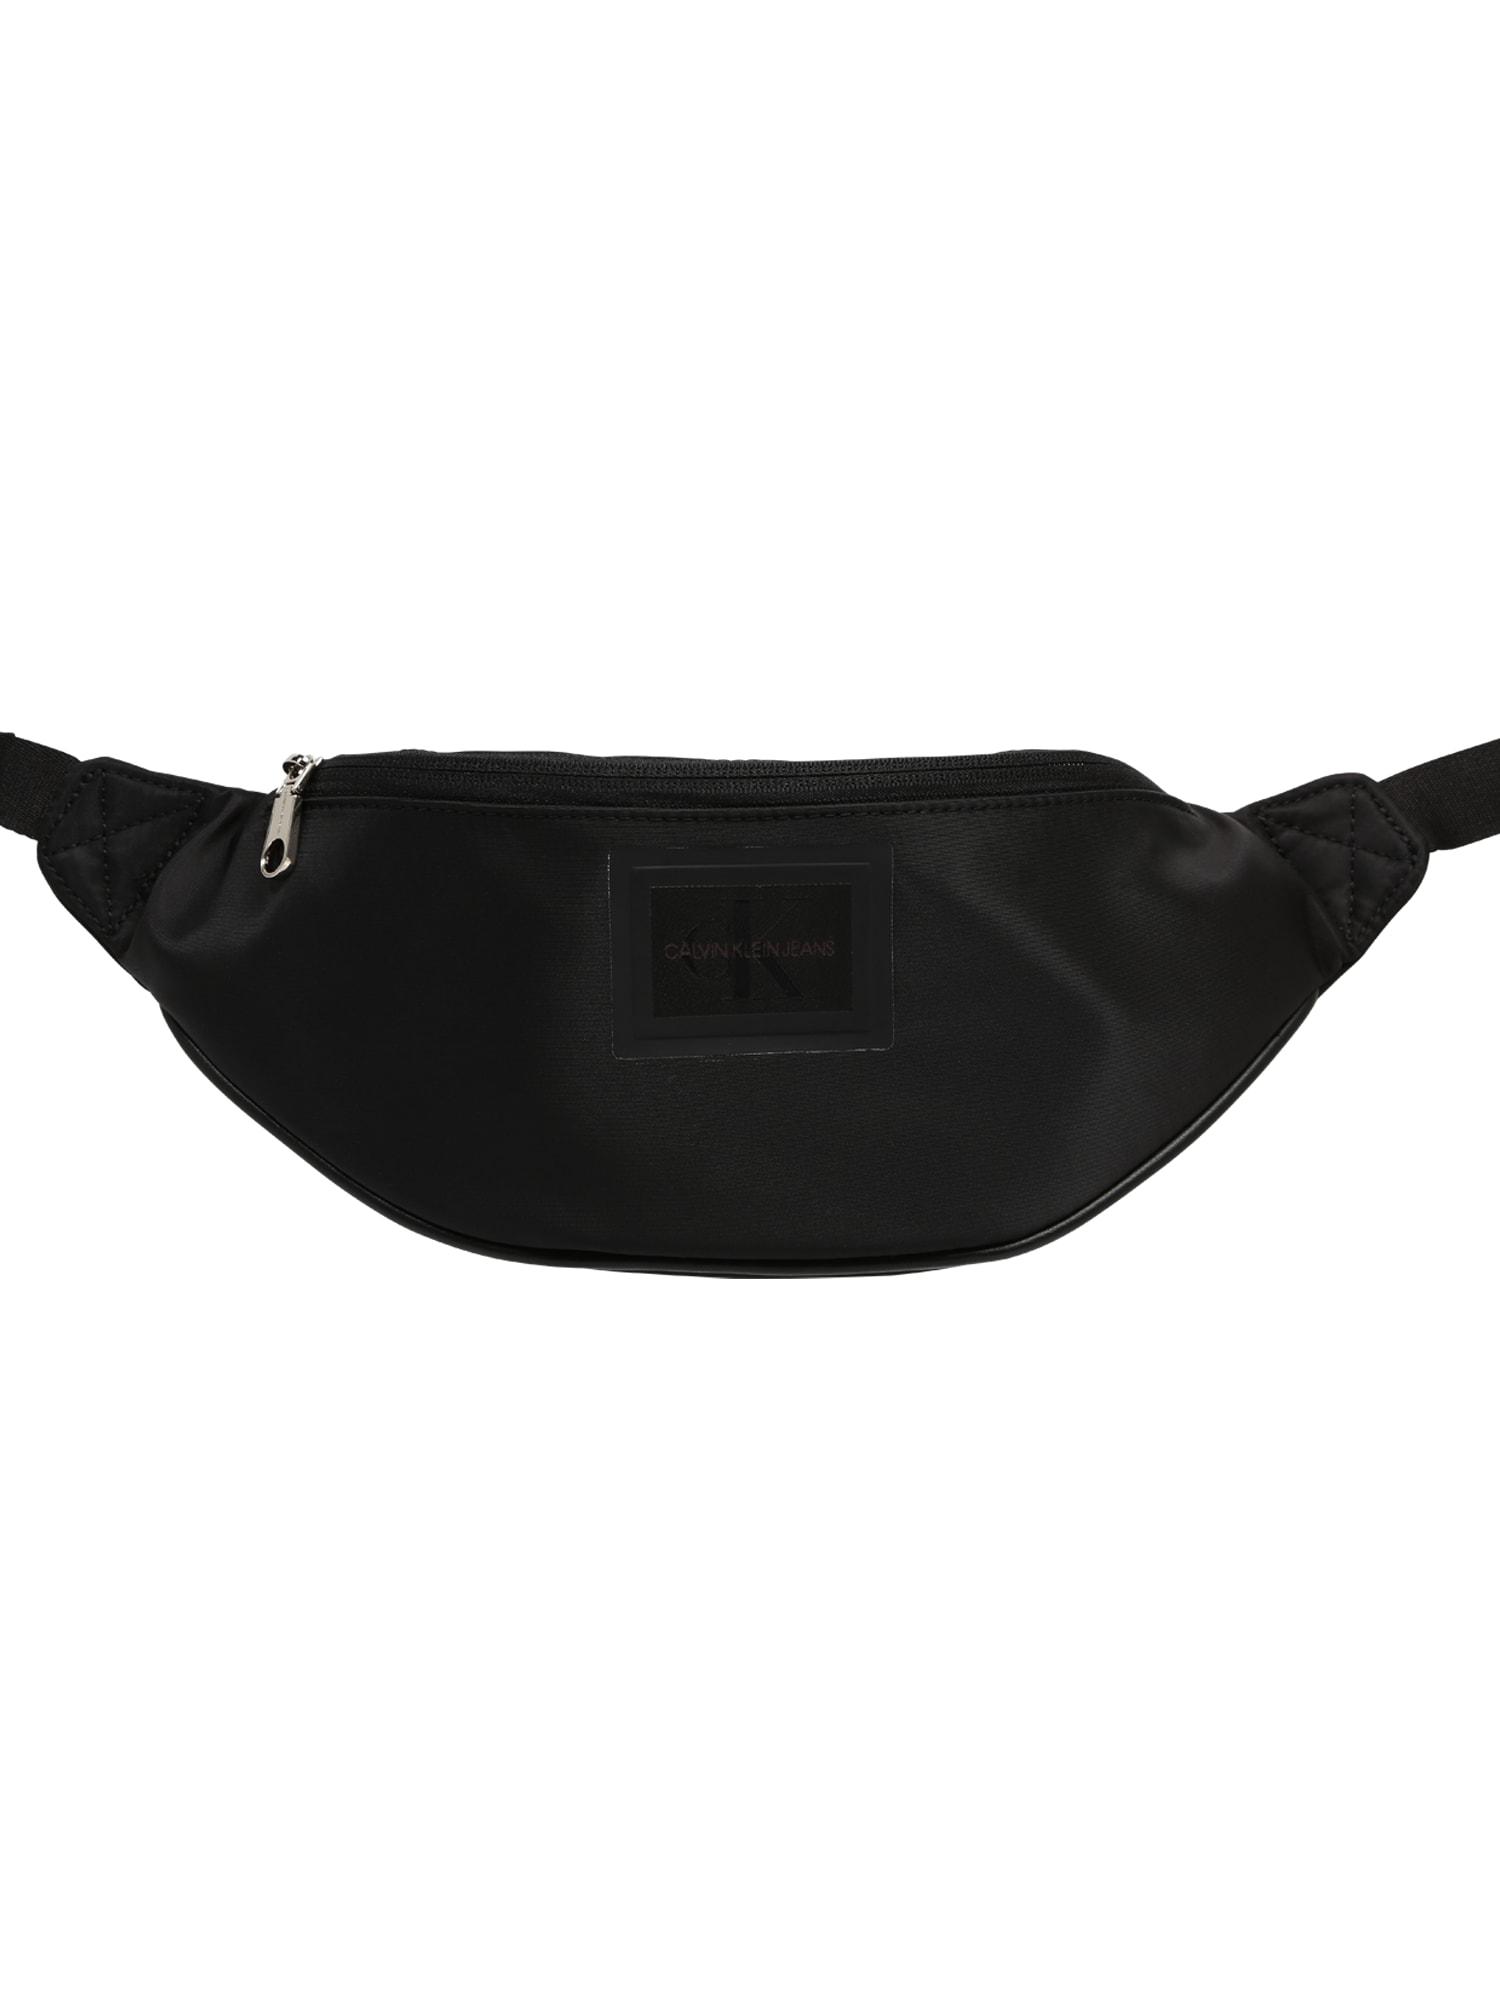 Calvin Klein Jeans Rankinė ant juosmens 'CKJ SLEEK NYLON STREETPACK' juoda